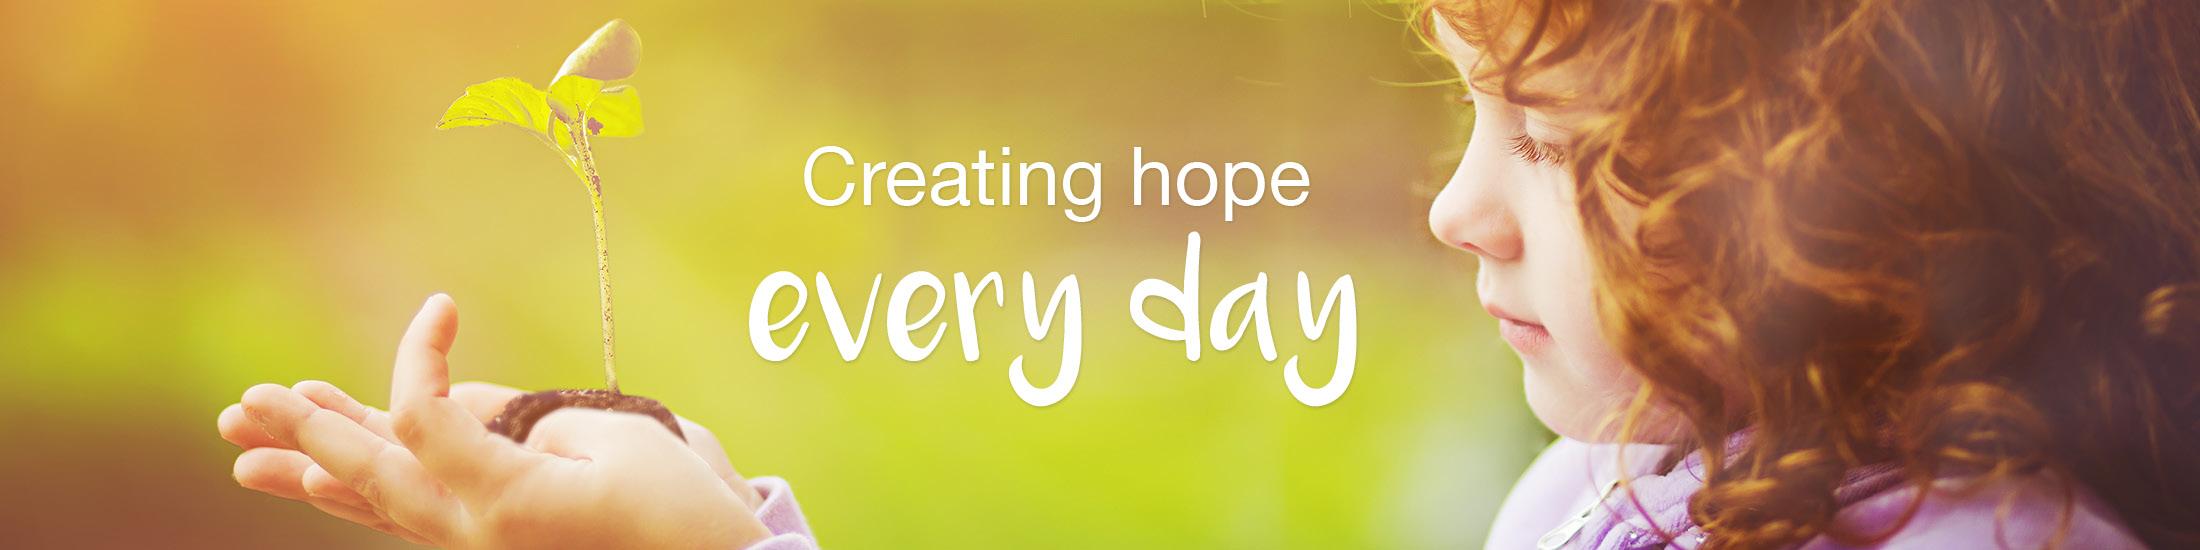 VM3715.1-MK-Creating-Hope-Foundation-Web-banner_1400x42311